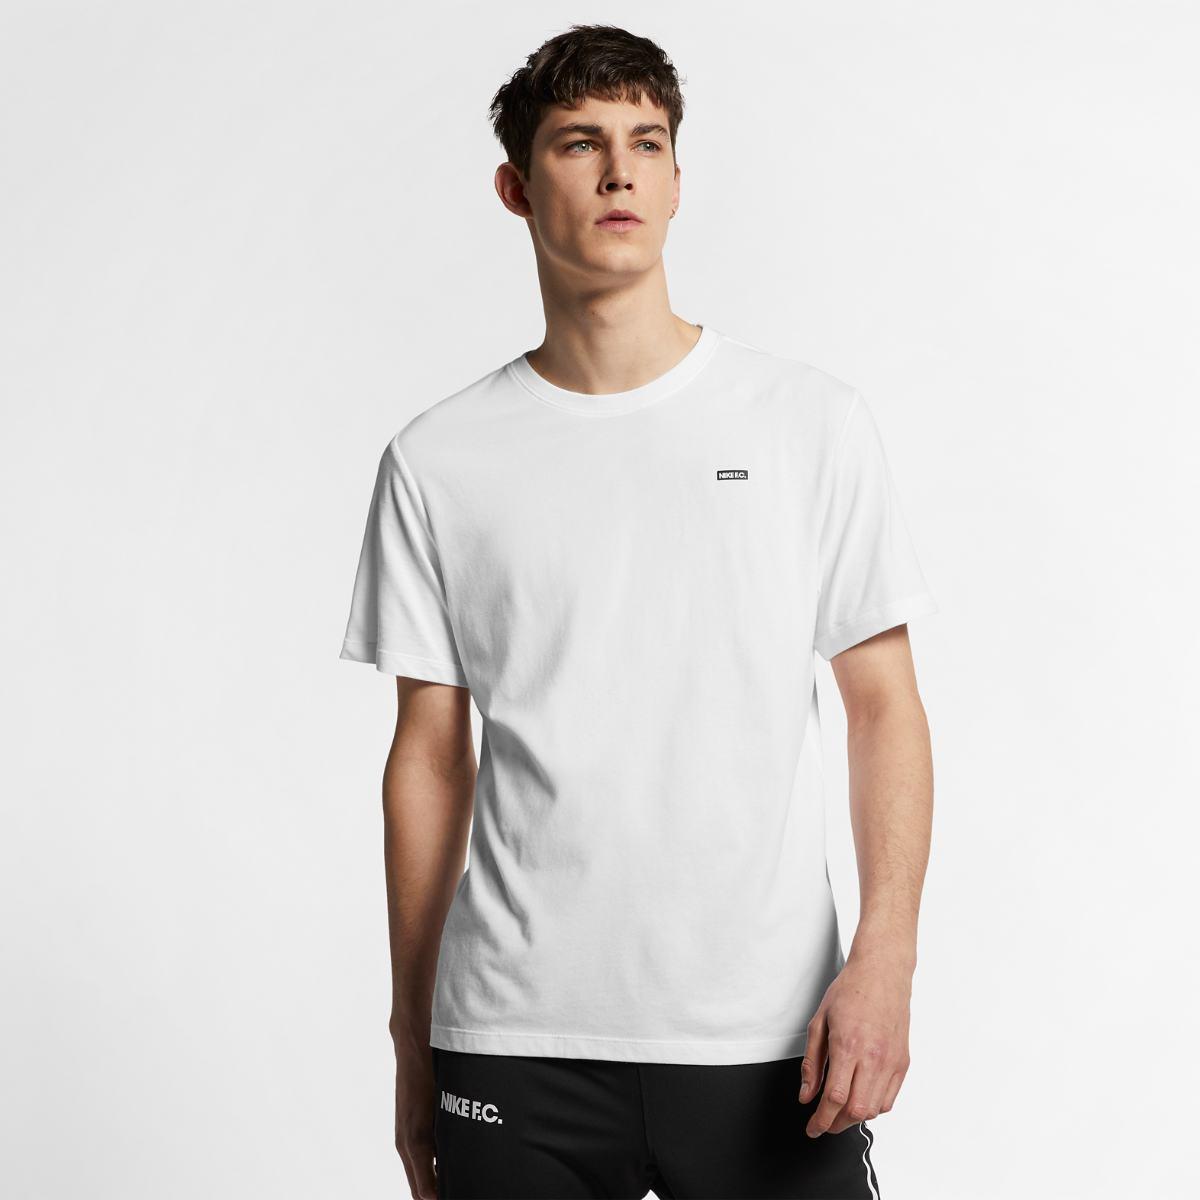 Футболка Nike F.C. Dry Block - White/Black - Оригинал. Размер L